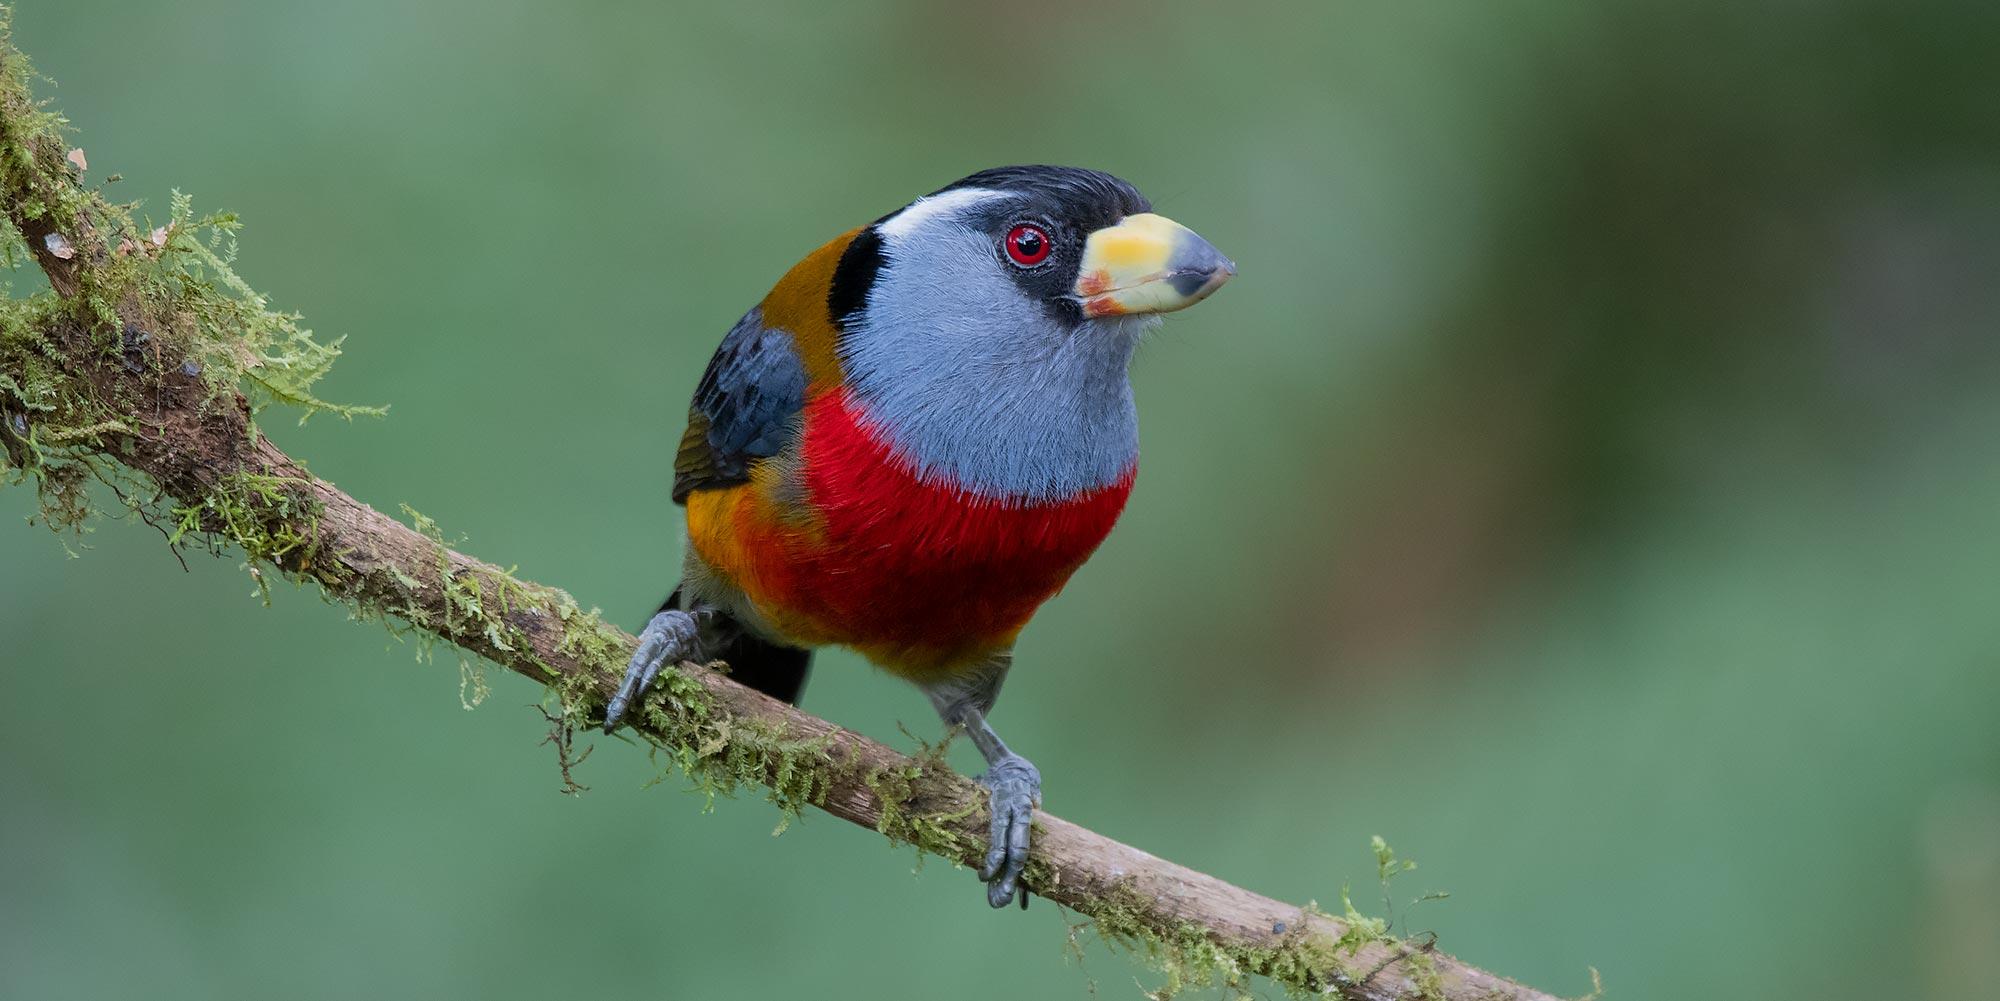 Neoselva-Semnornis-ramphastinus-Birding-Mindo-Website